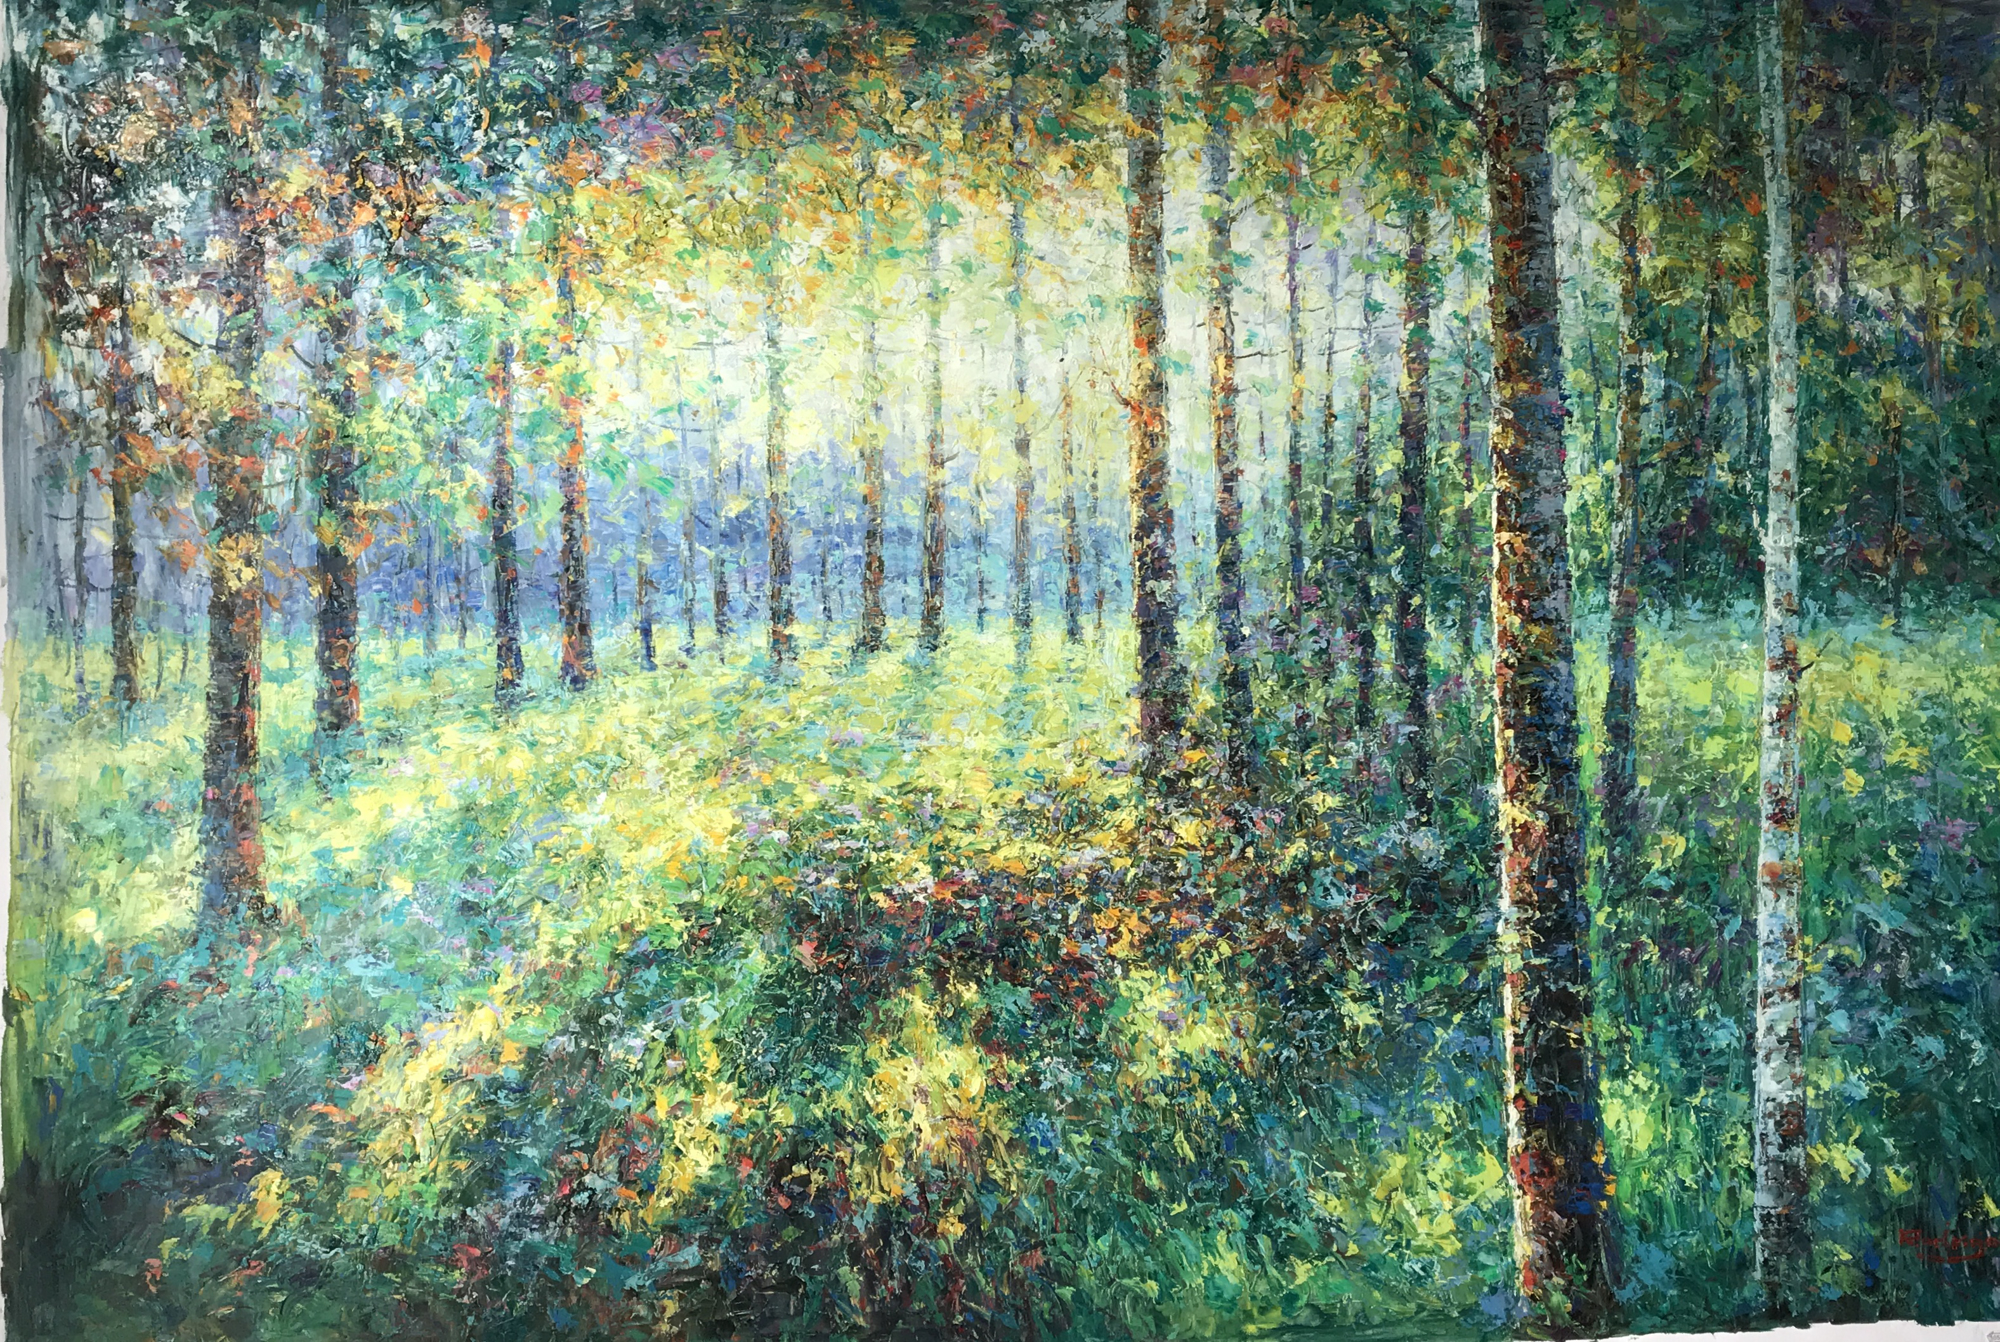 SUNLIGHT THROUGH TREES NO PATH by RODRIGO